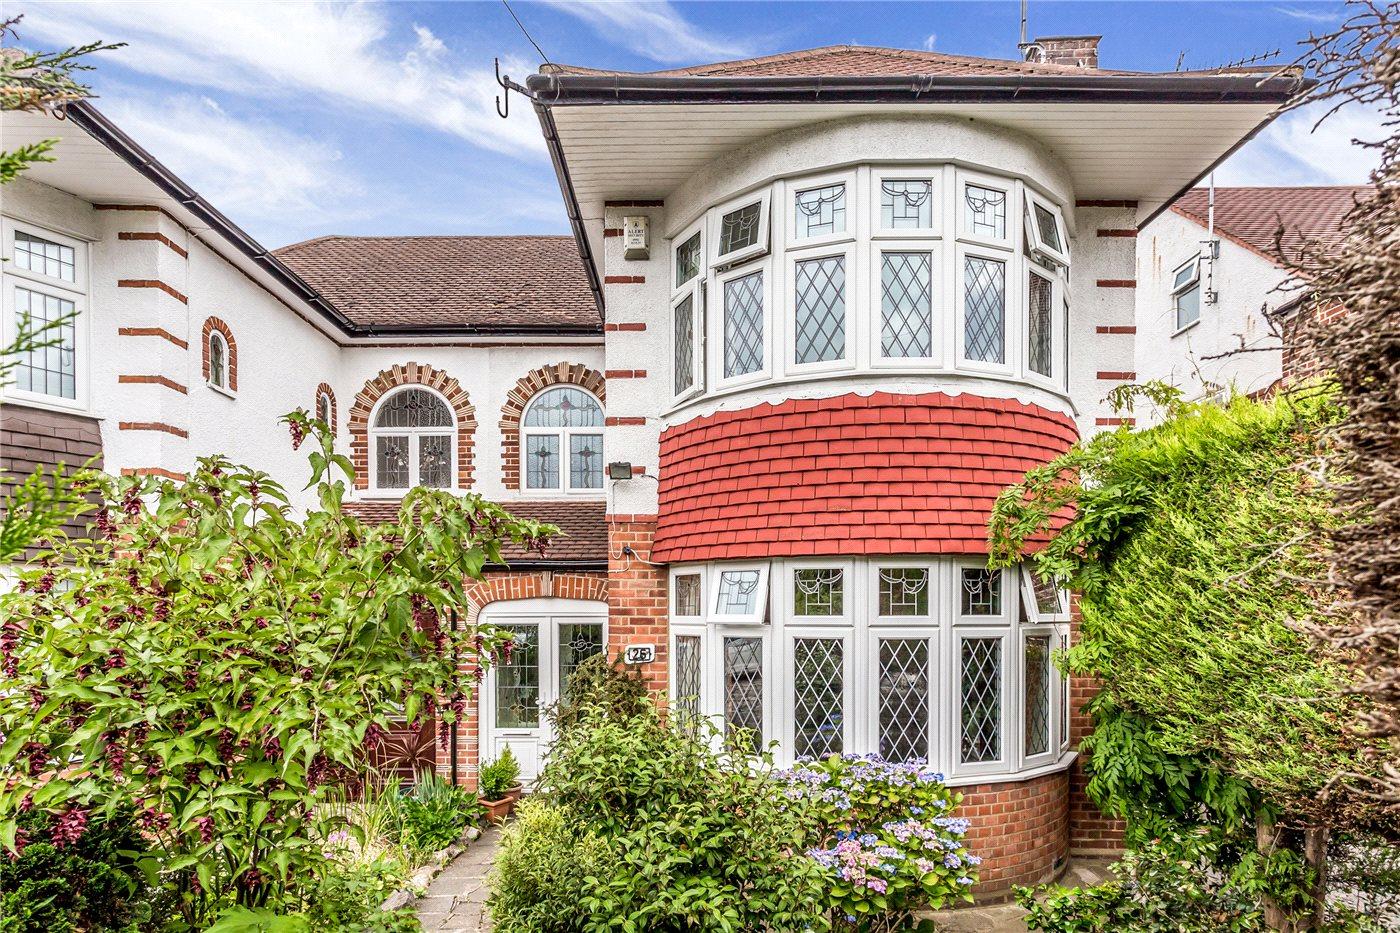 3 Bedrooms Semi Detached House for sale in Bincote Road, Enfield, Middx, EN2